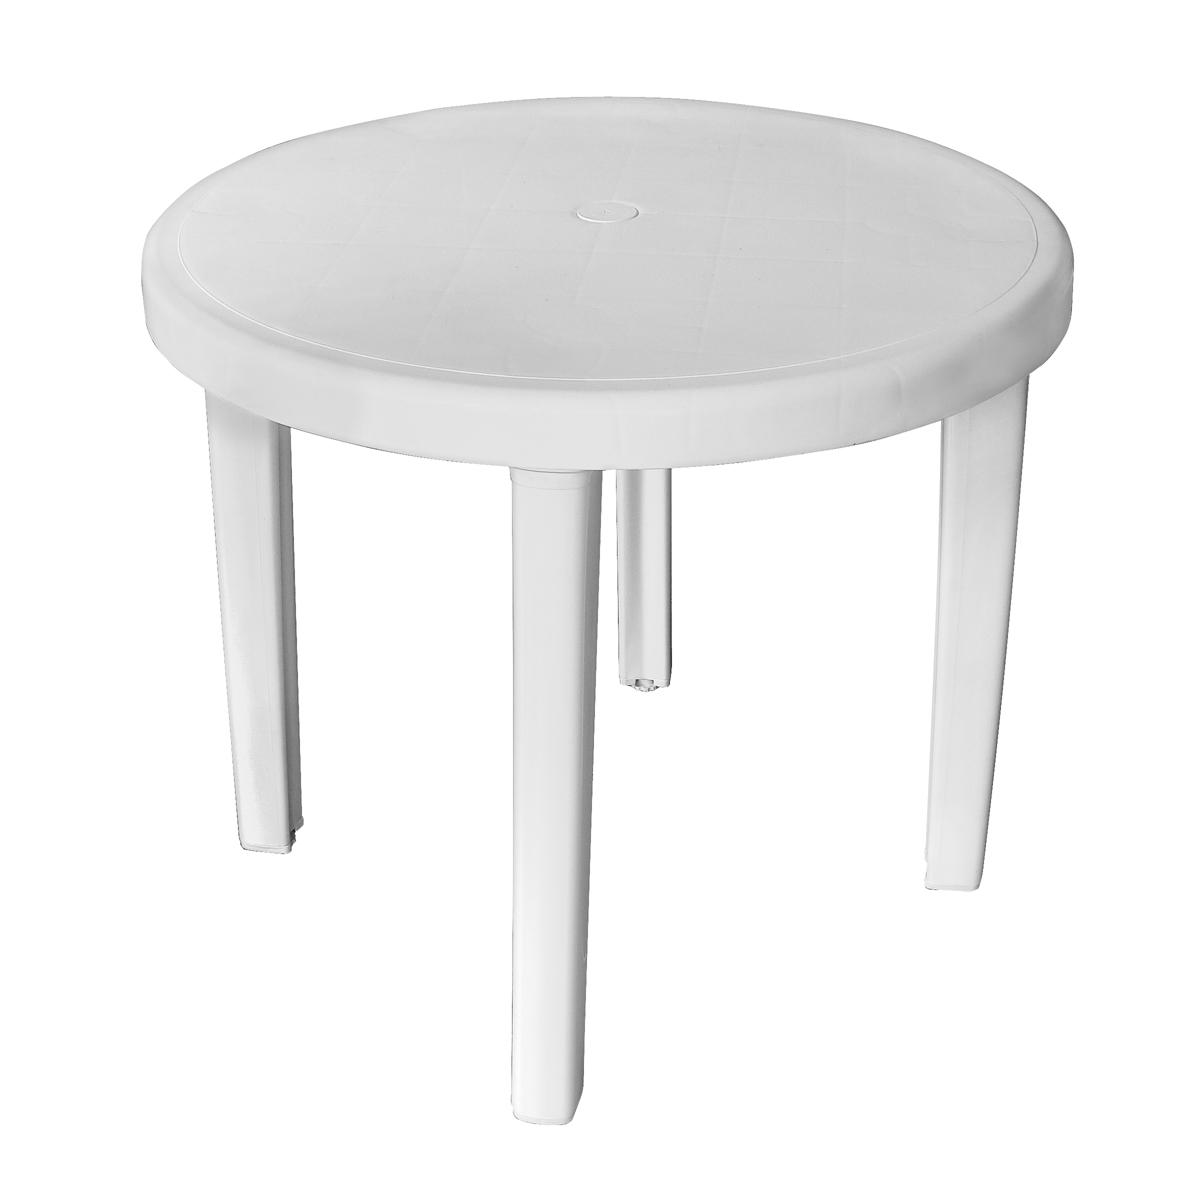 Mesa redonda plástica 4 lugares com pés plásticos